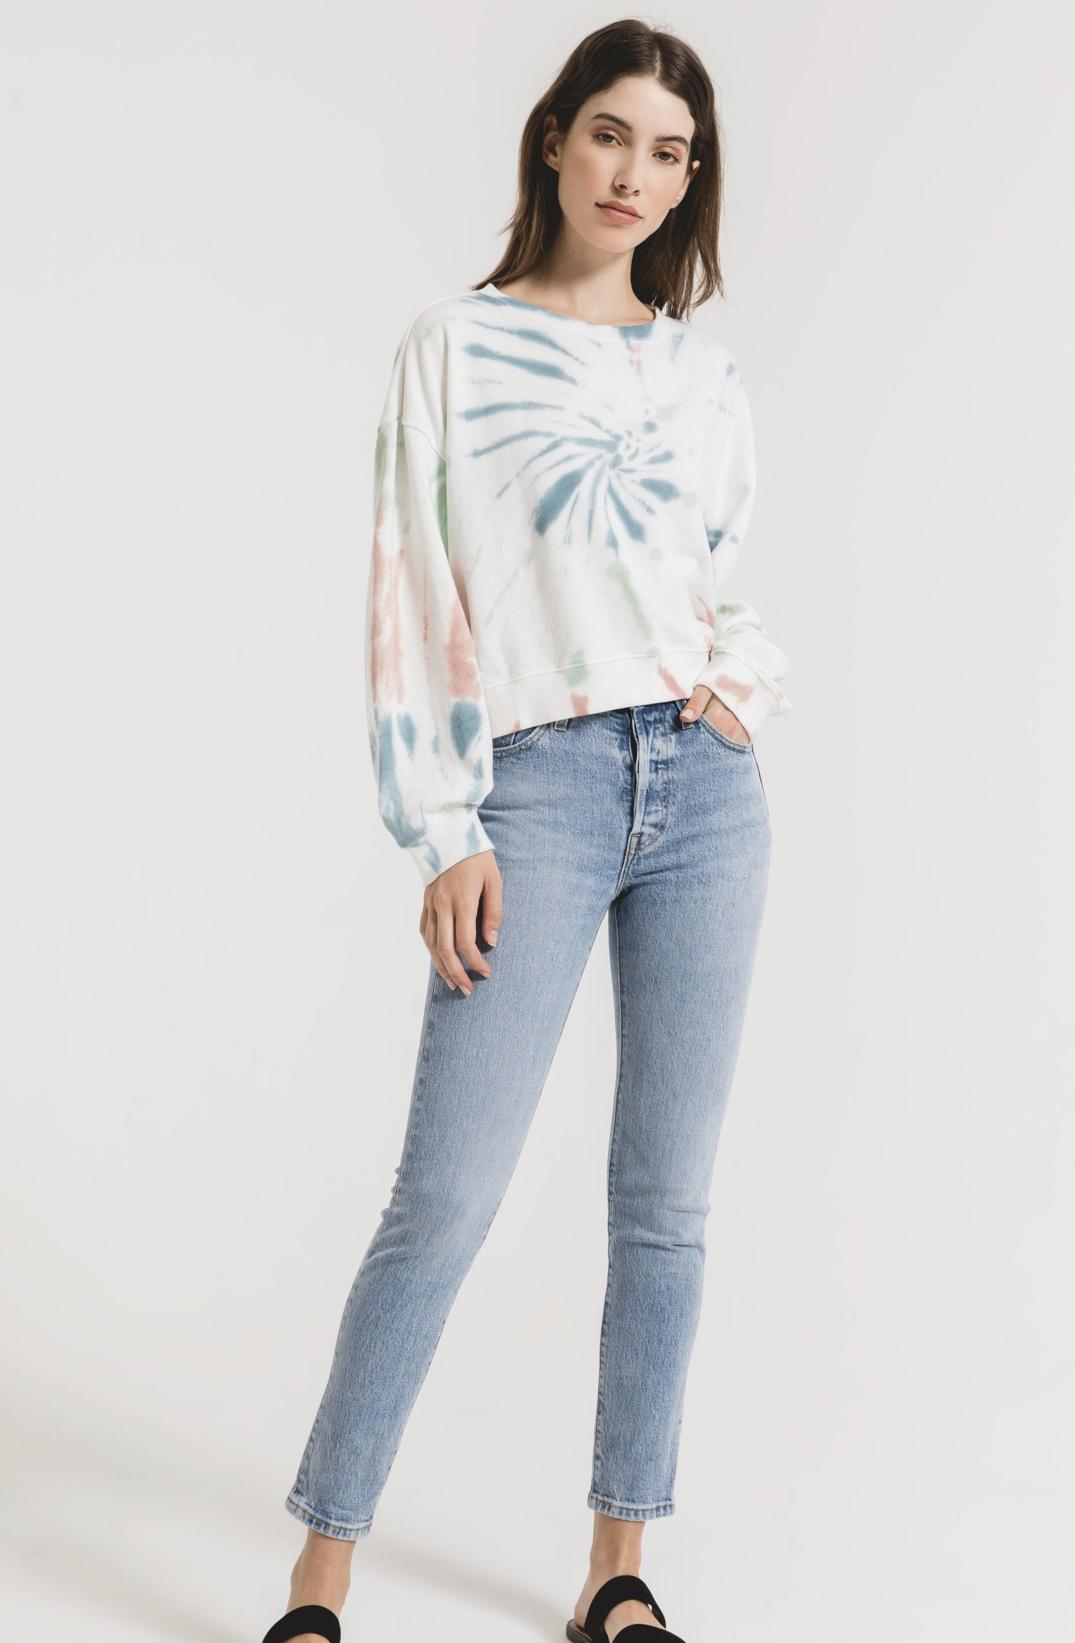 Z Supply Multi Color Tie-Dye Pullover  - Desert White